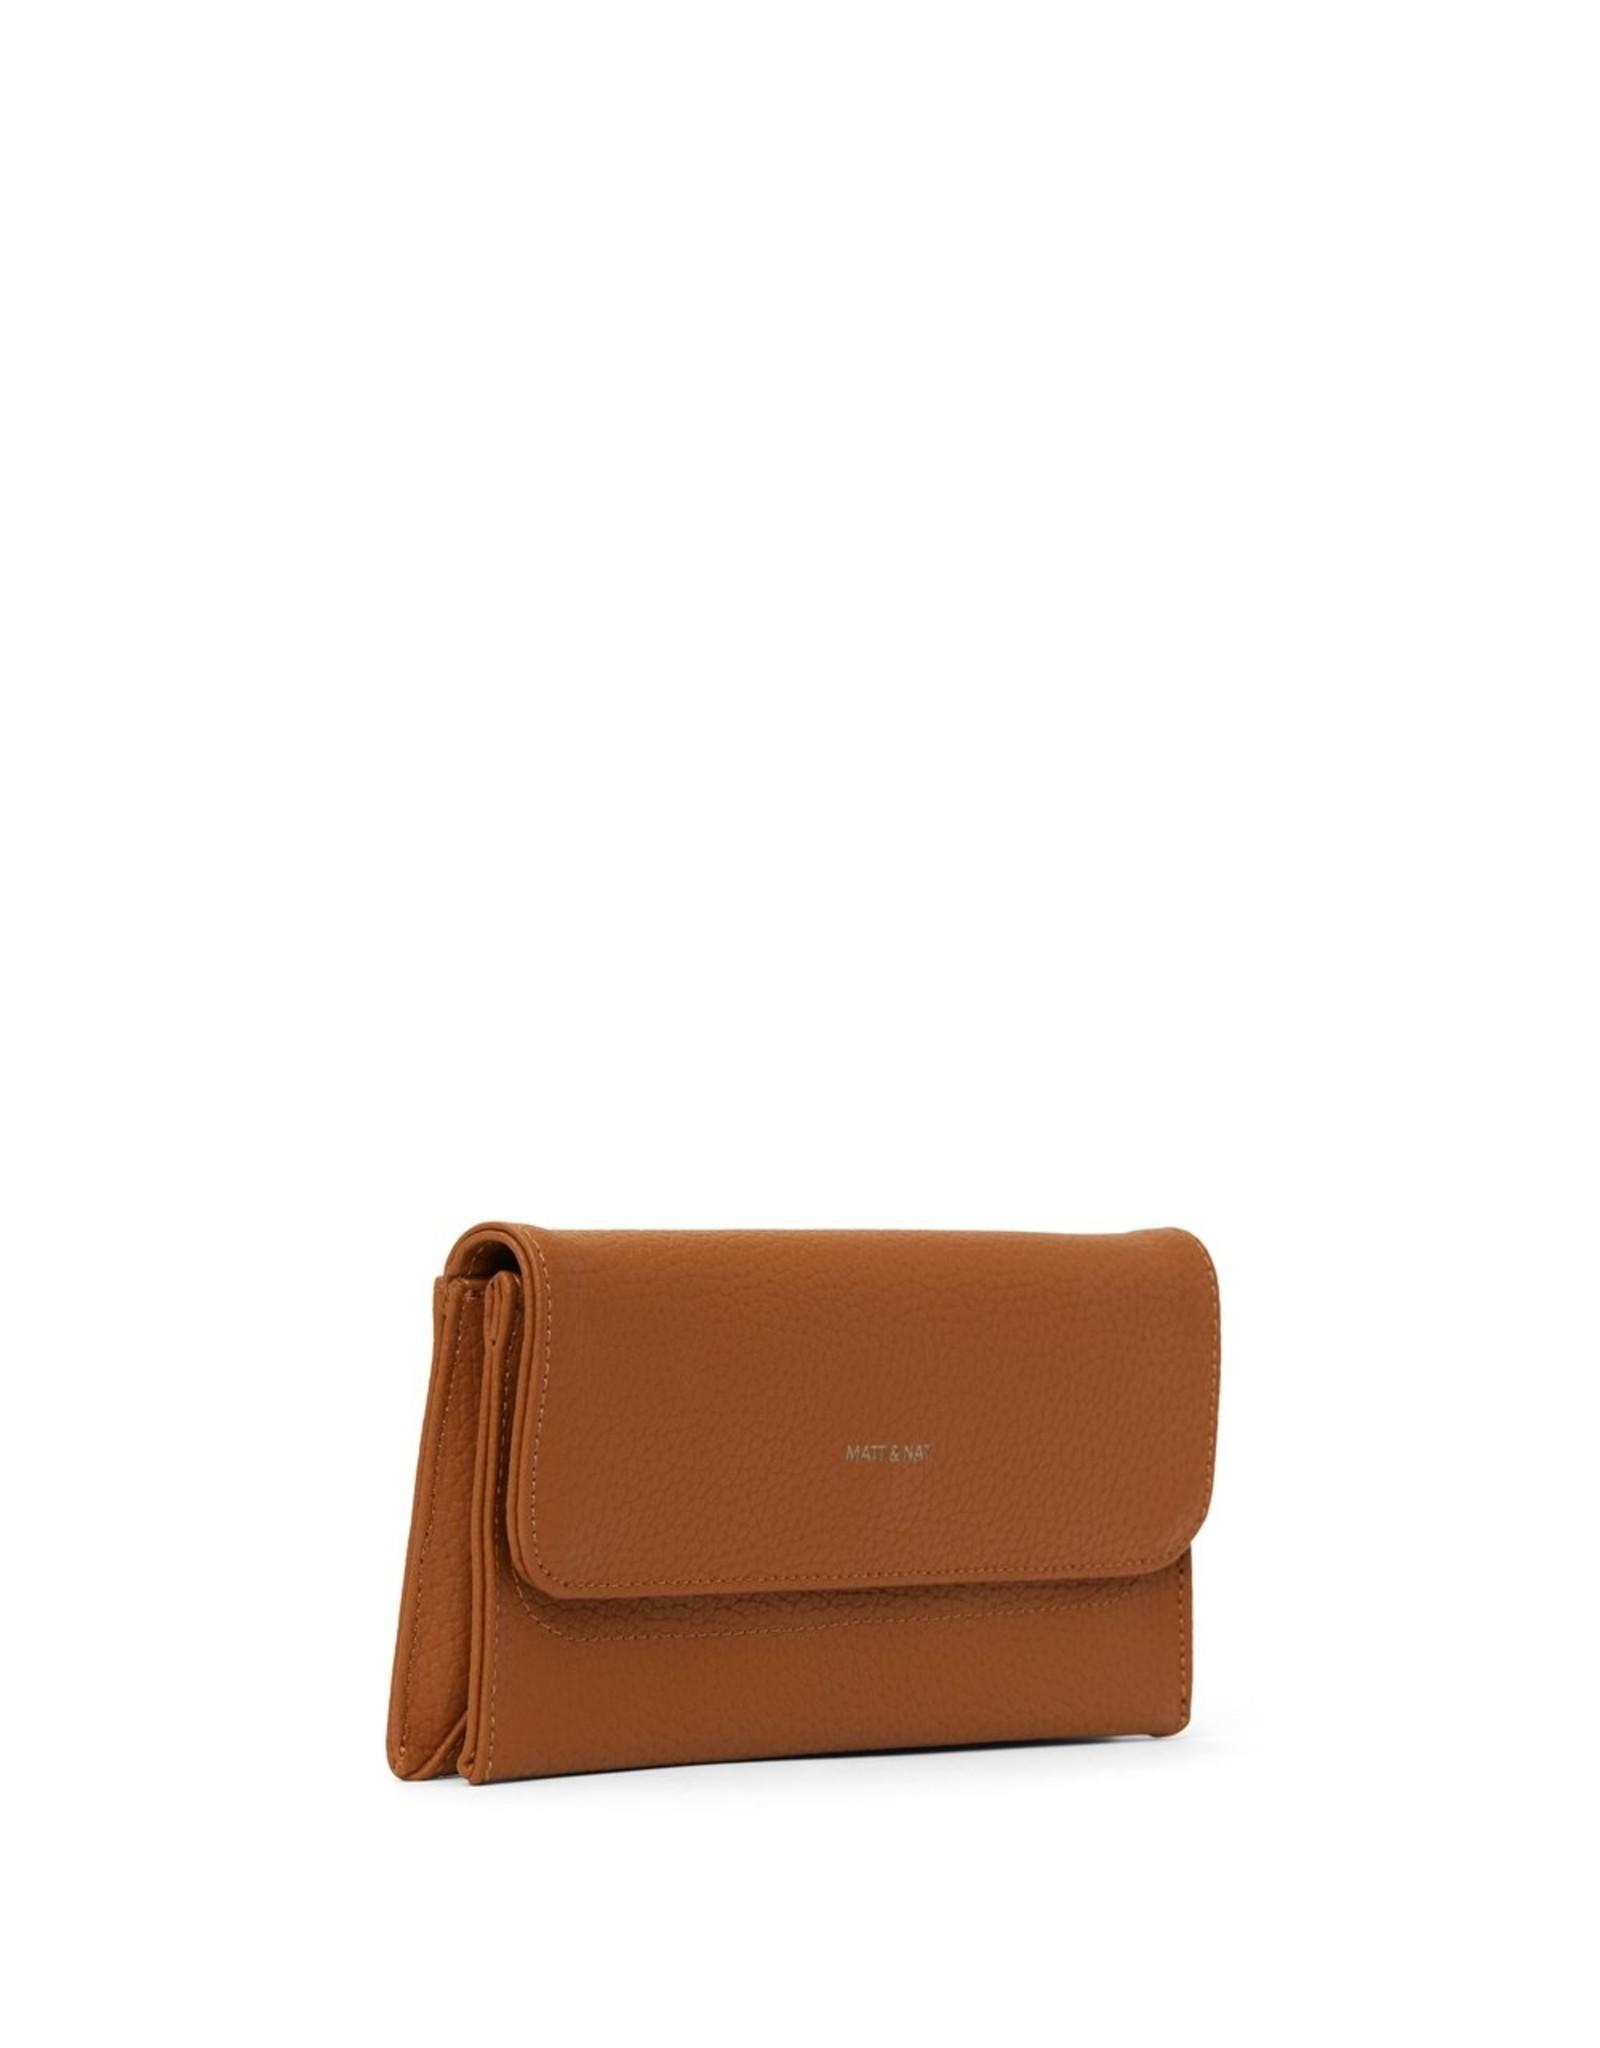 Purity Wallet, Niki/Carotene